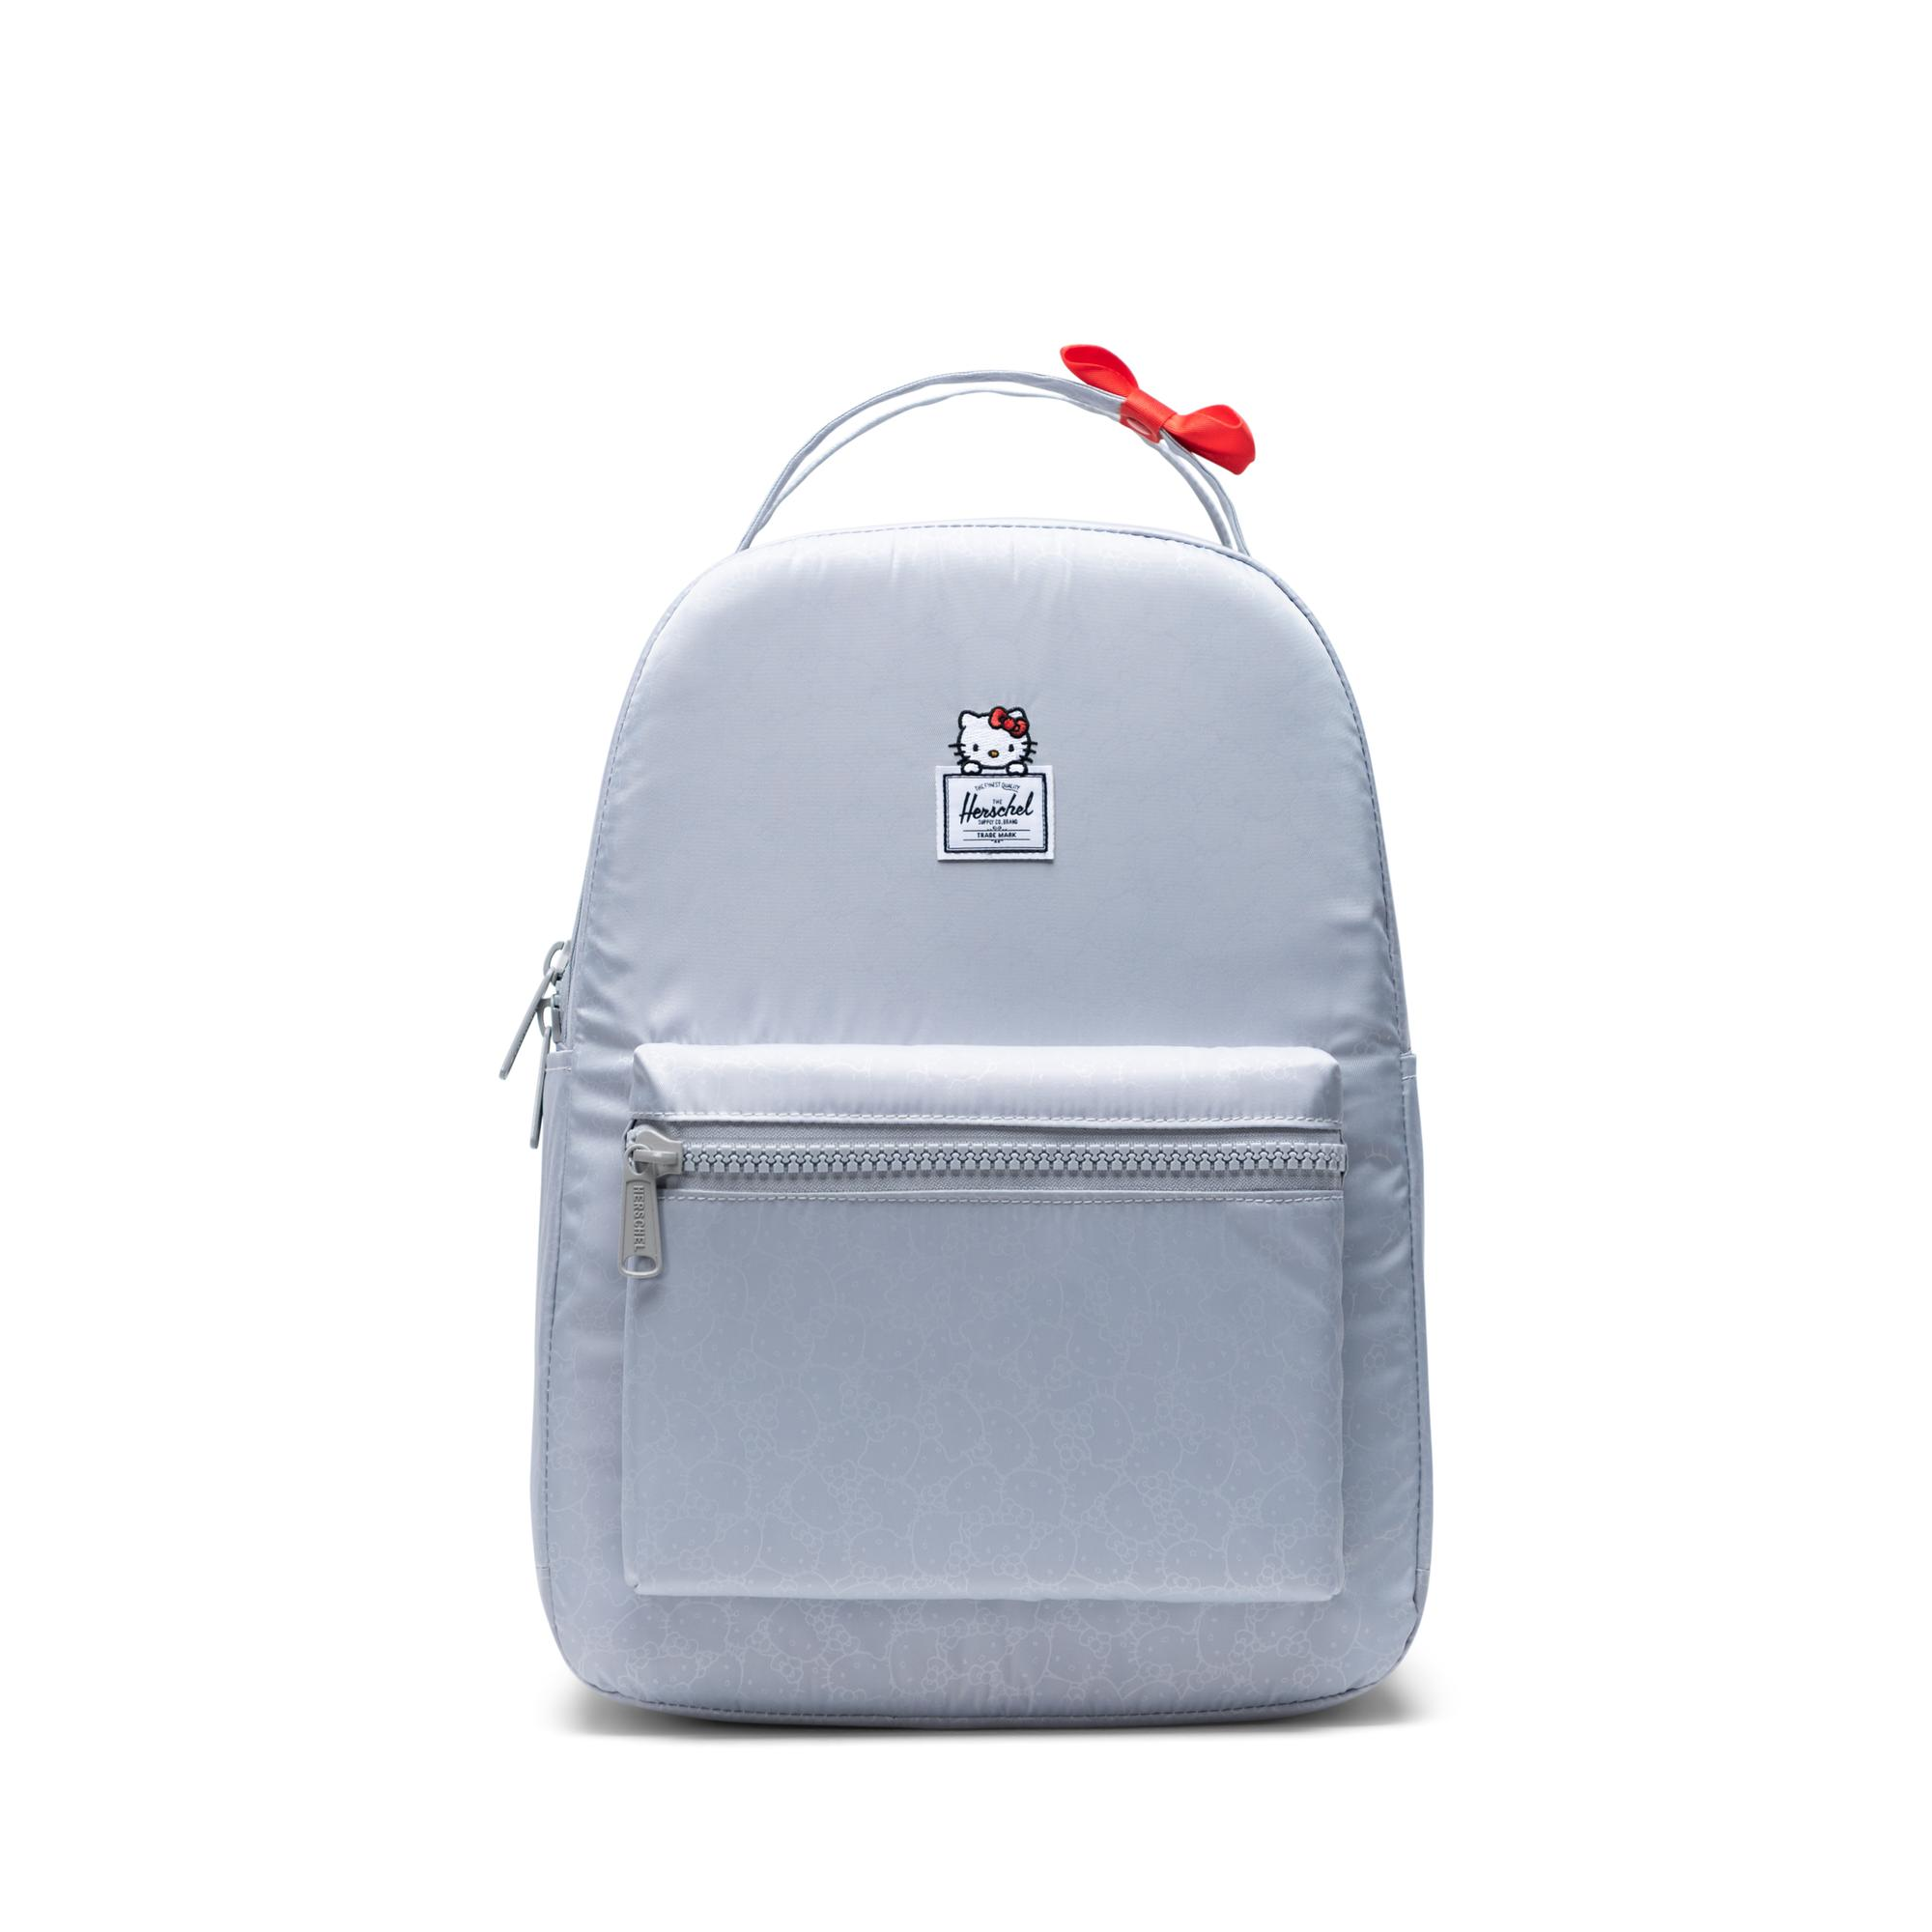 fd522d0e9 Nova Backpack Mid-Volume Hello Kitty | Herschel Supply Company